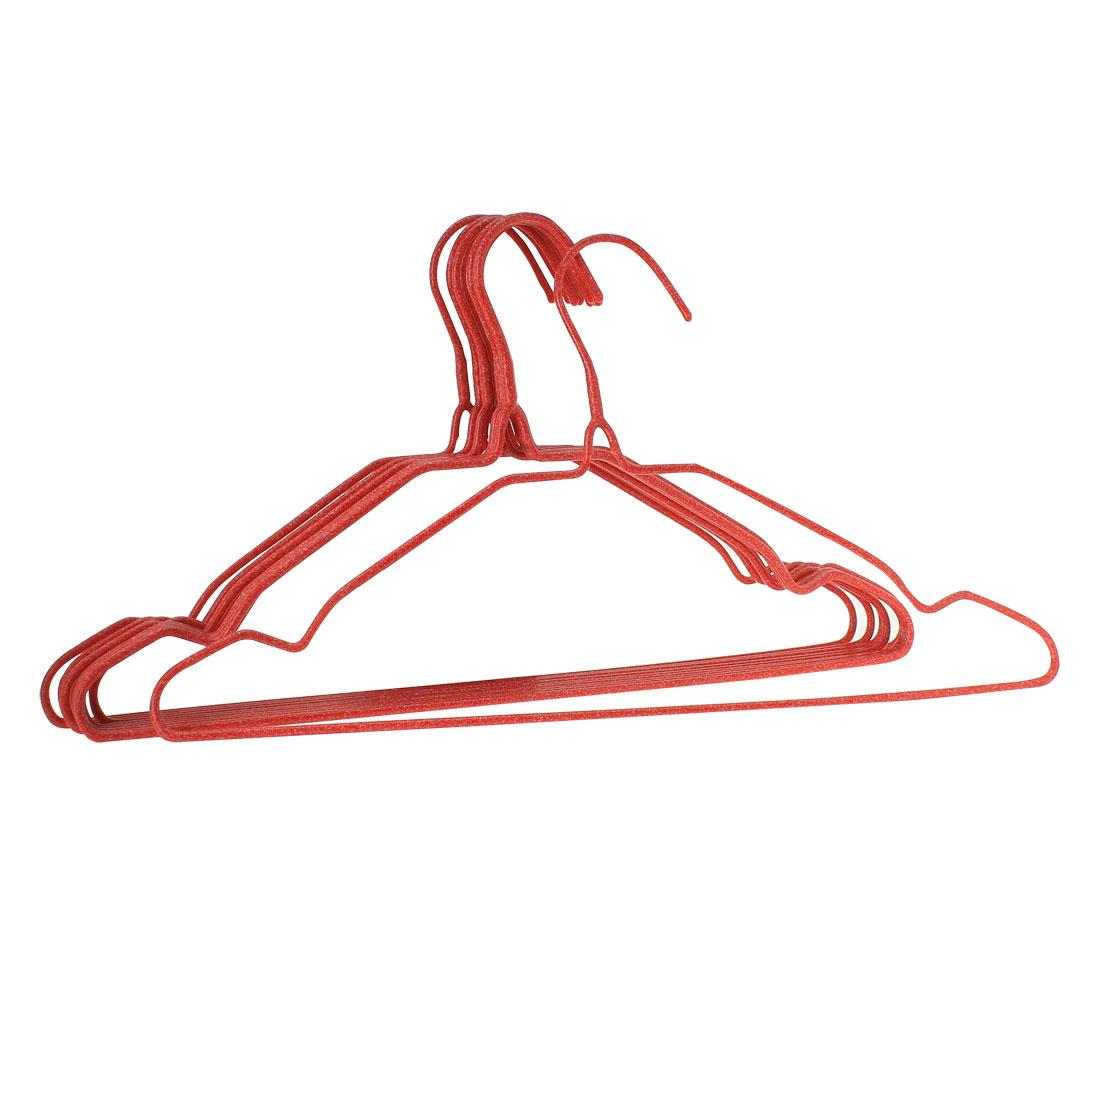 Home Wardrobe Cloths Pant Hook Nonslip Red Plastic Hanger 10 Pcs